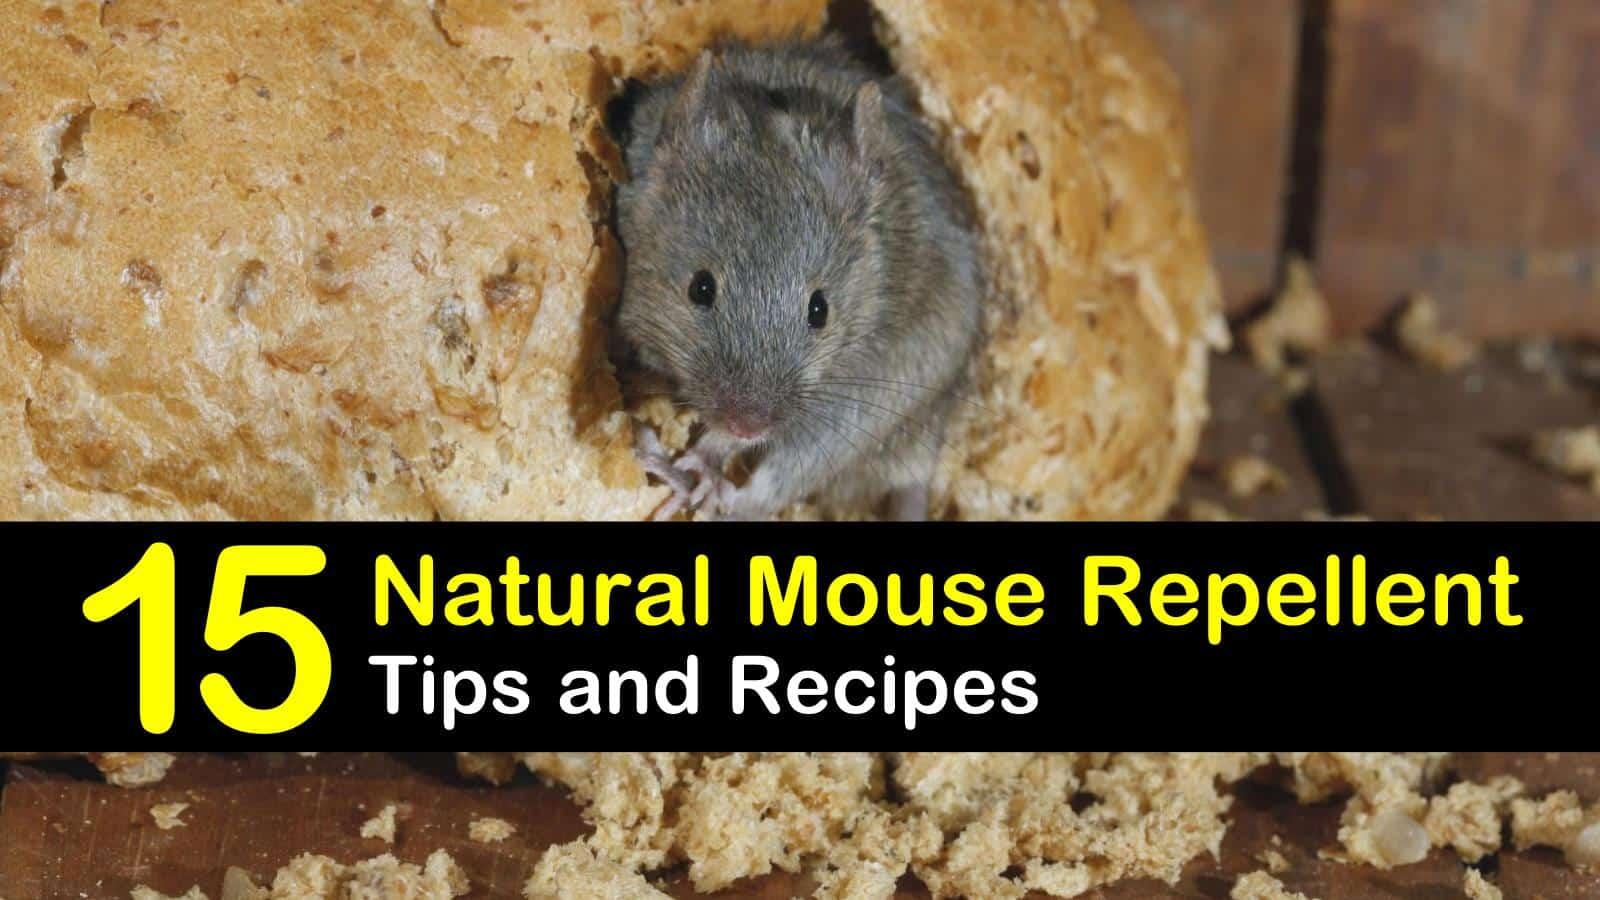 natural mouse repellent titleimg1